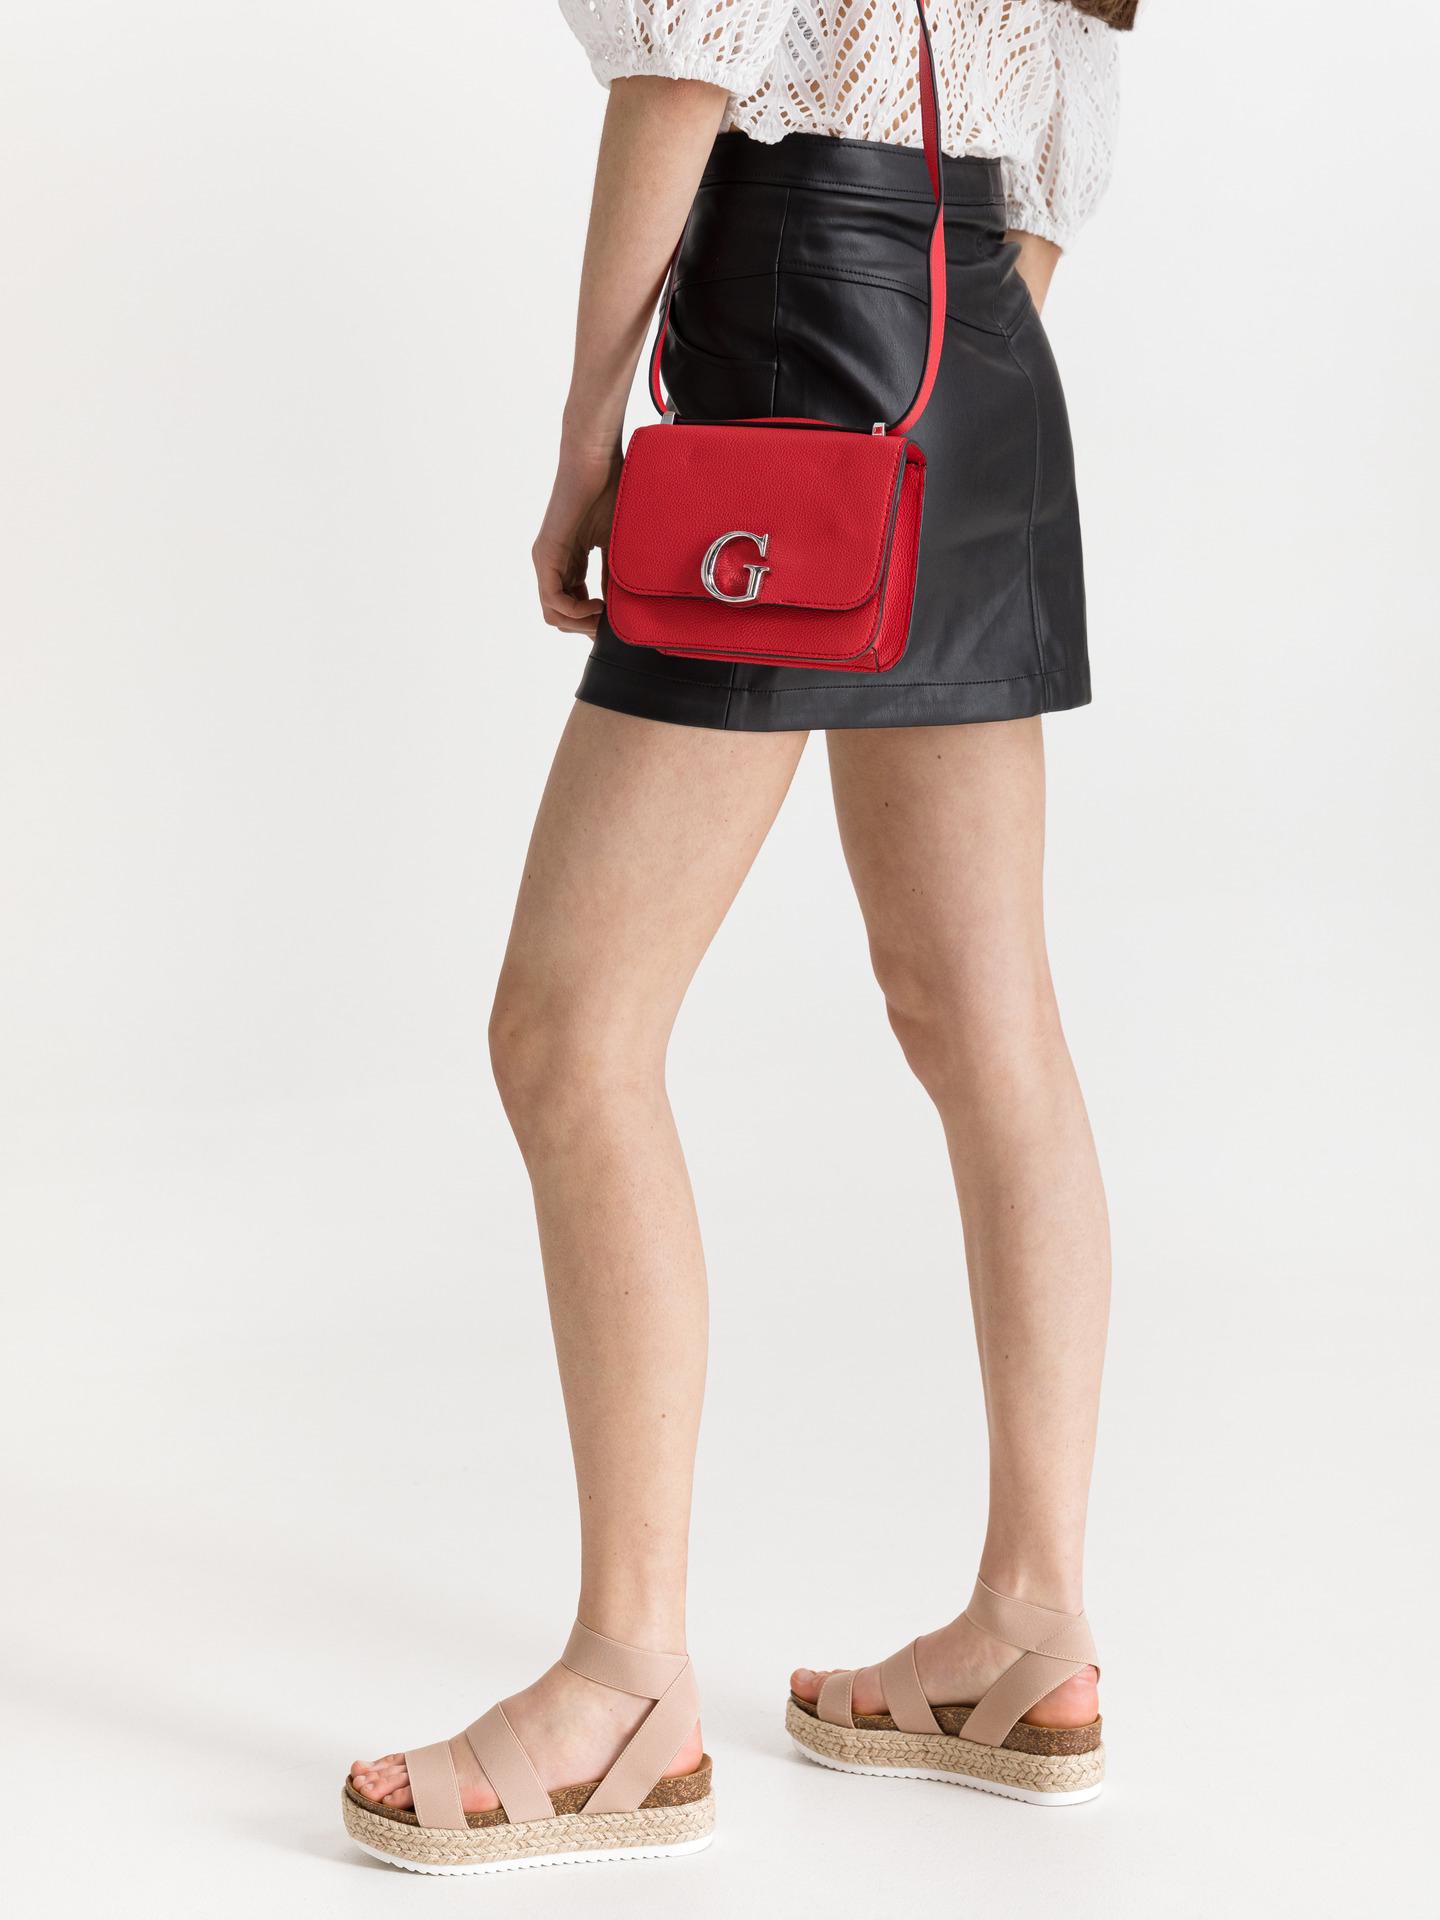 Guess red crossbody handbag Corily